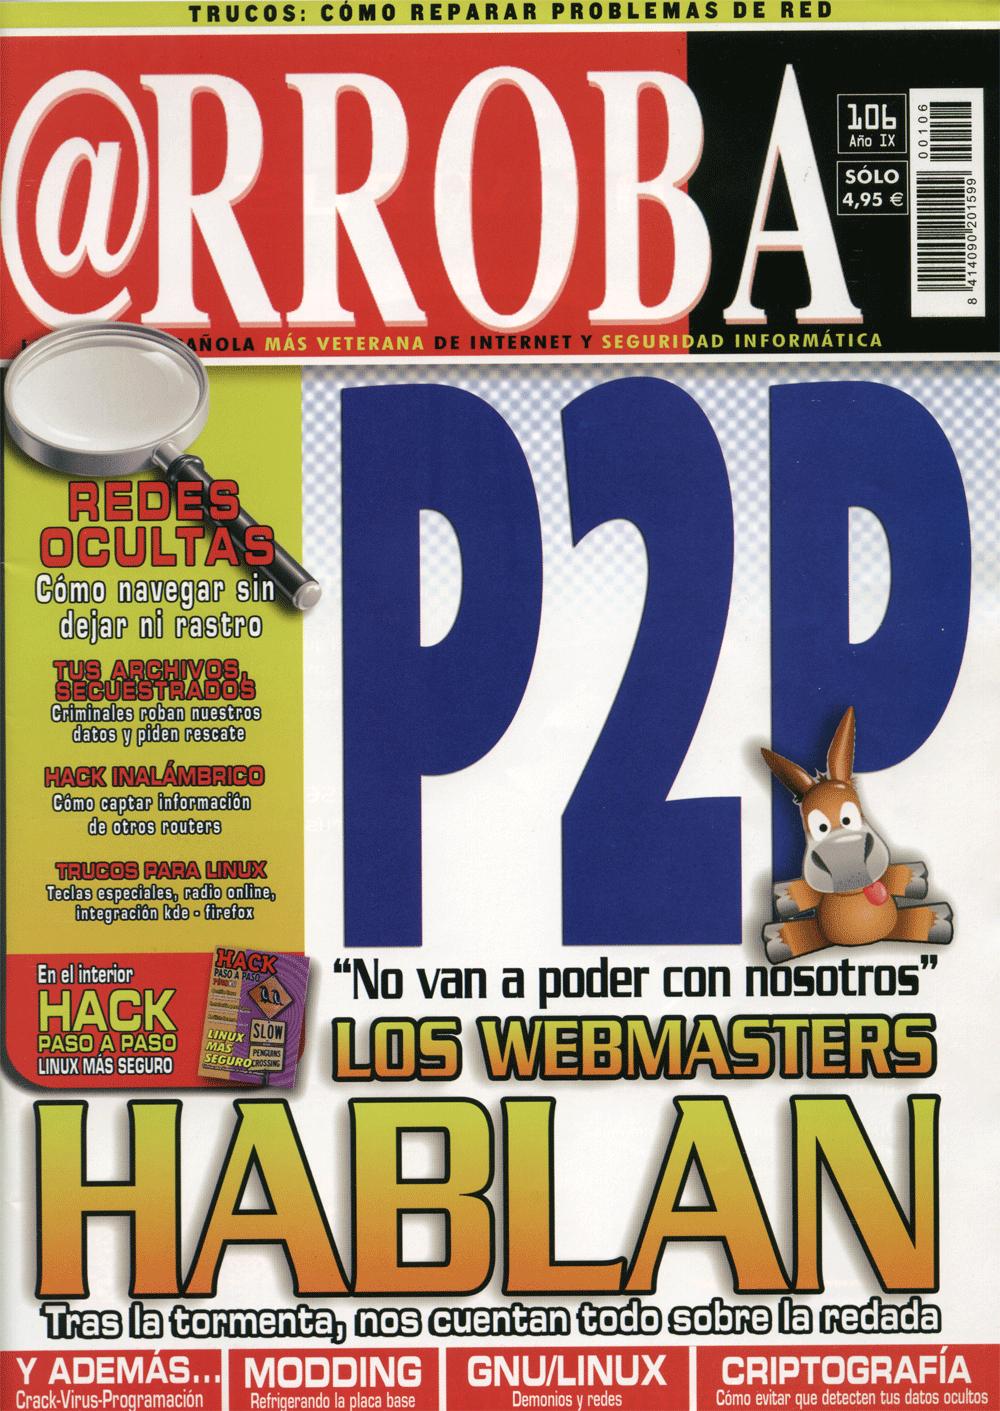 Portada de la revista @rroba de julio del 2006 (Pinche en la imagen ...